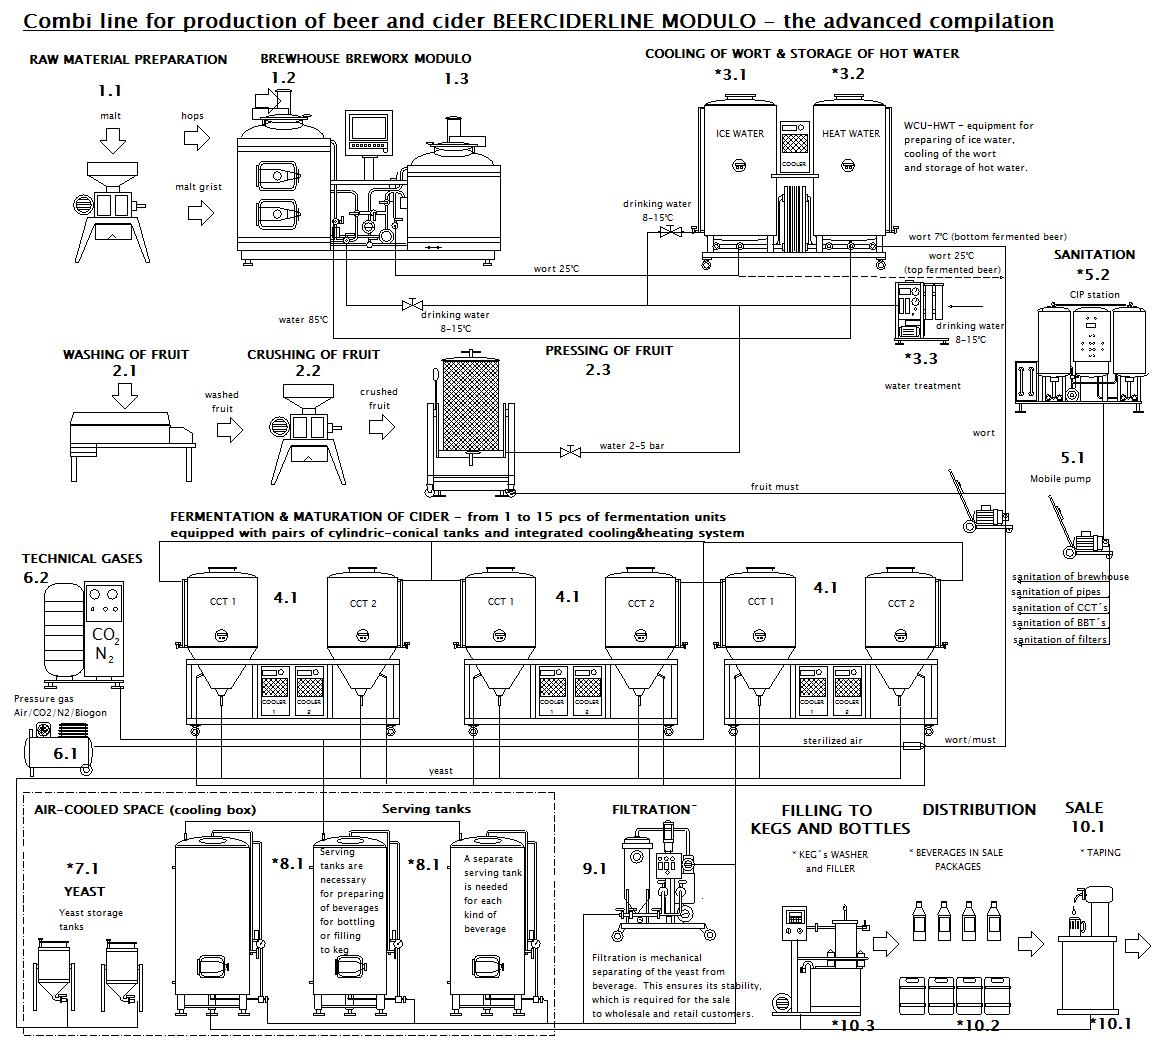 BeerCiderLine Modulo - skema teknike